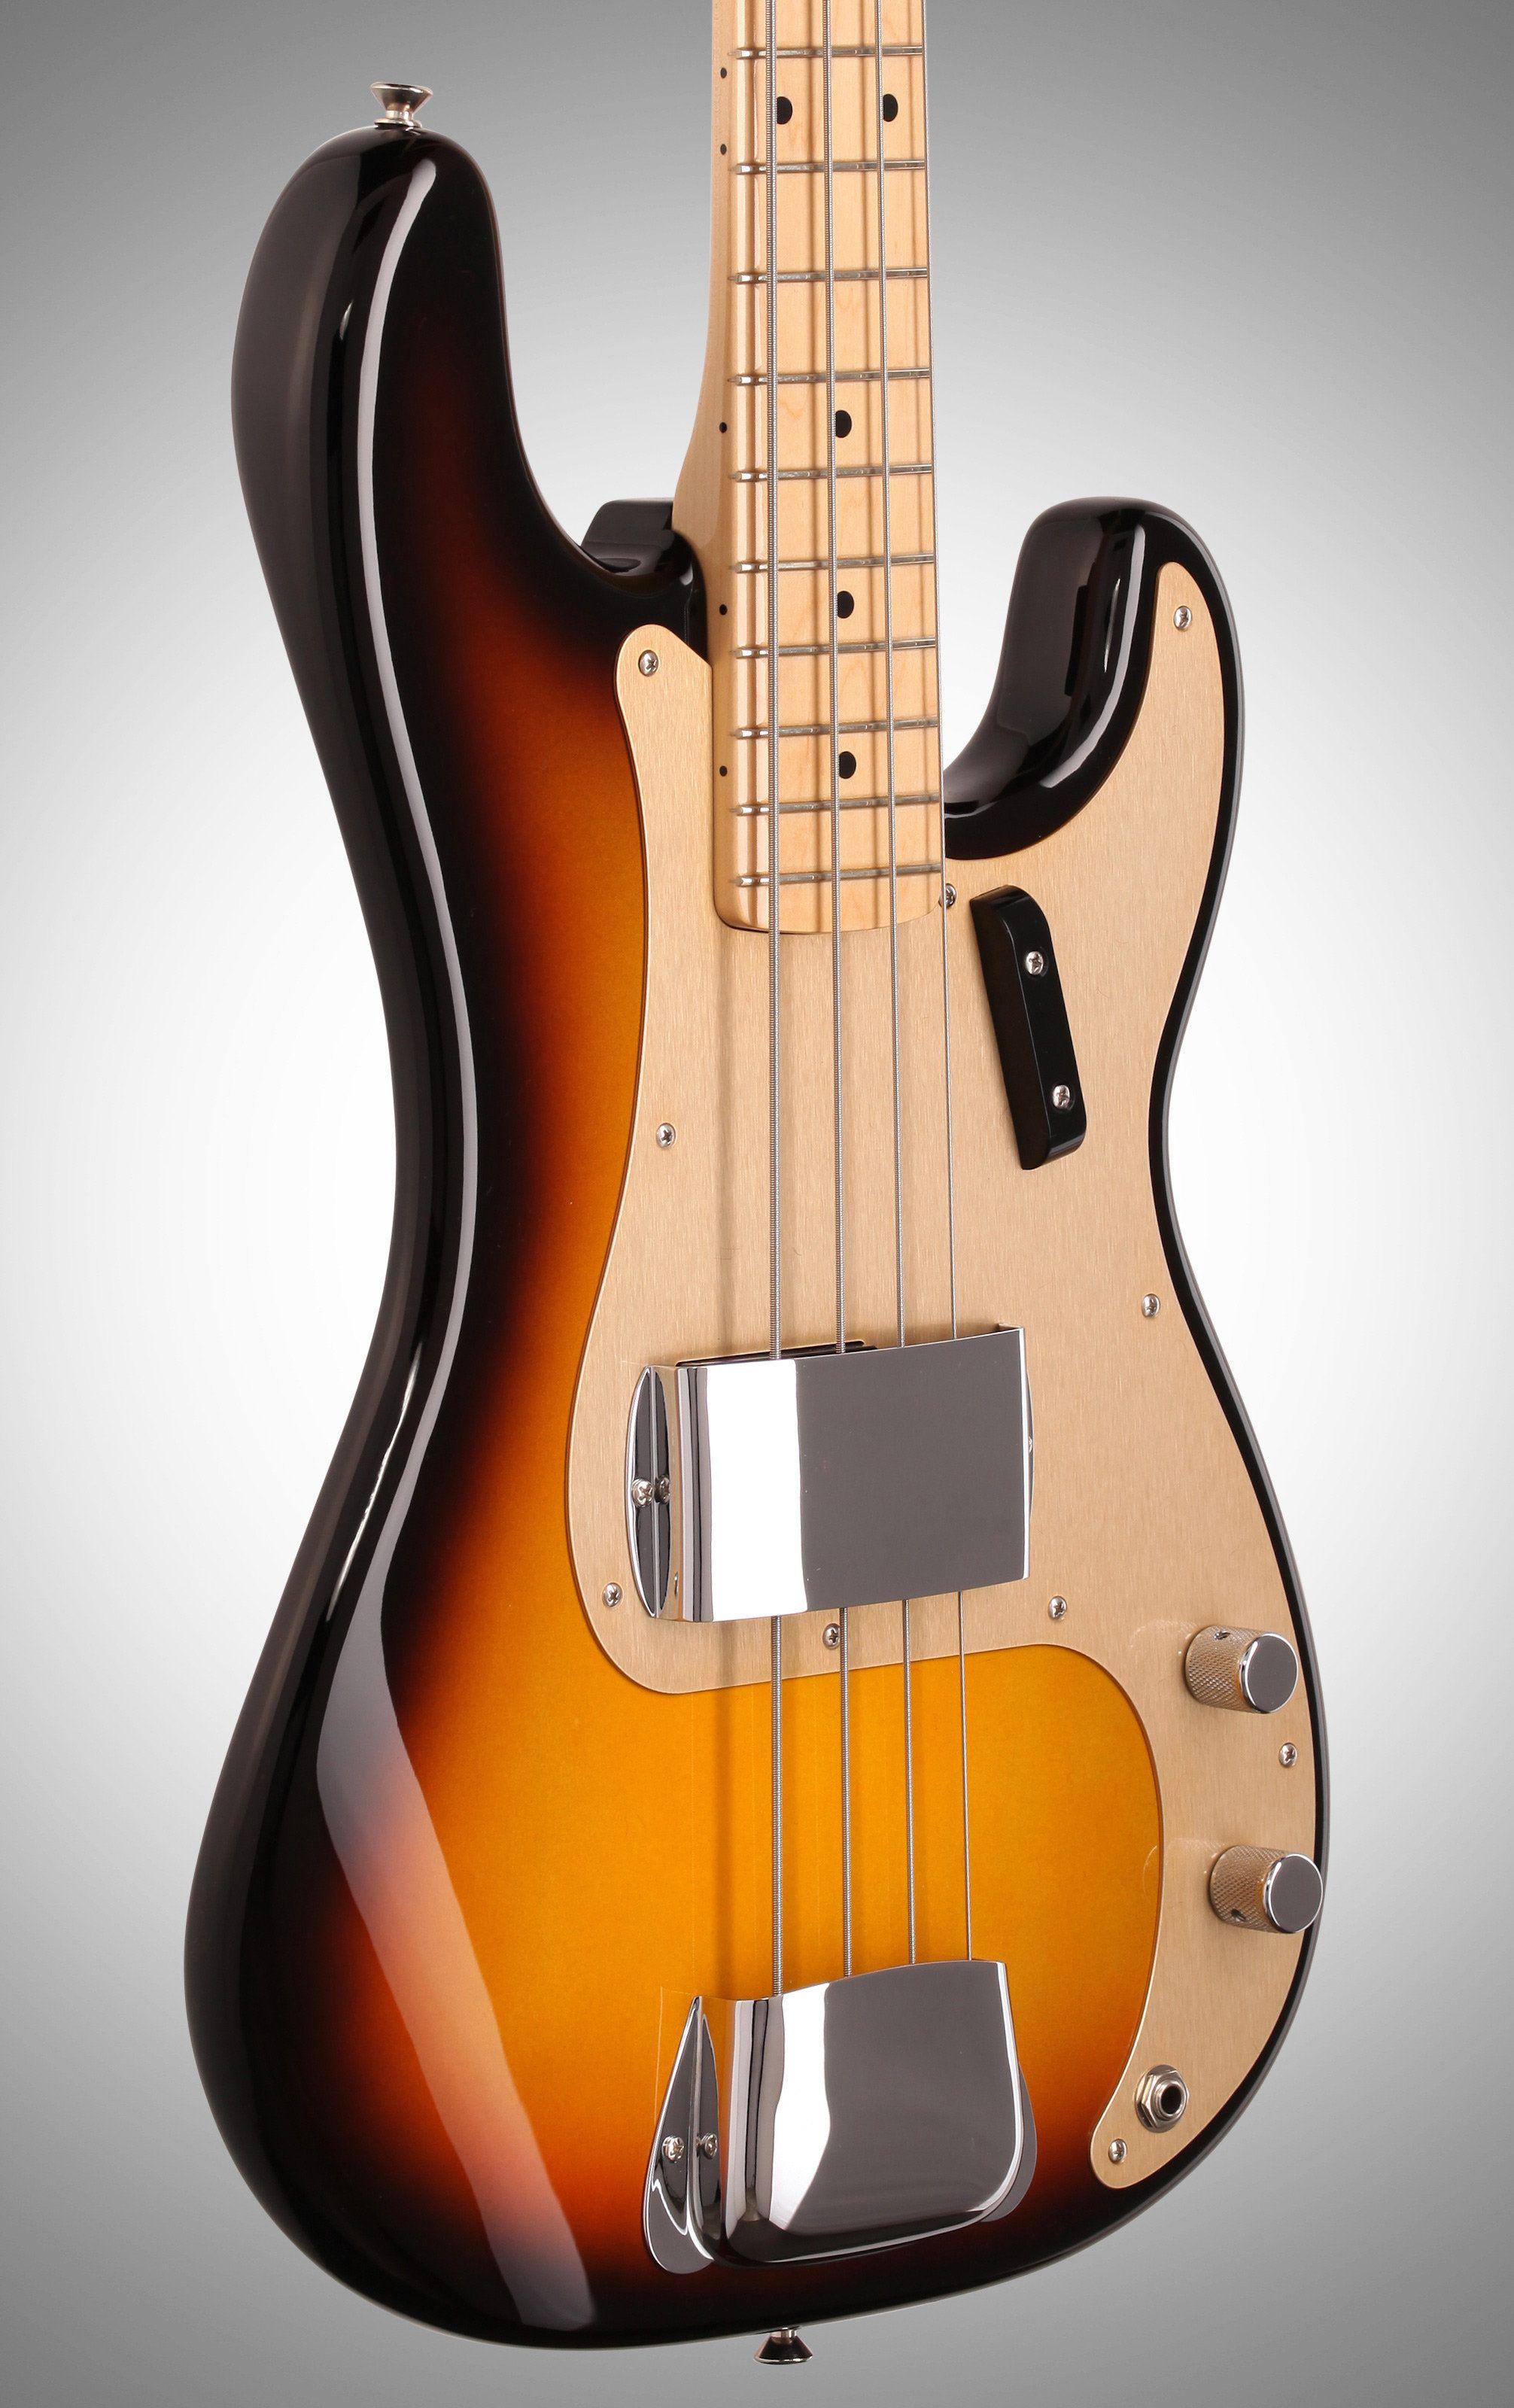 Fender American Vintage 58 Precision Electric Bass Fender American Vintage Fender Precision Bass Fender P Bass